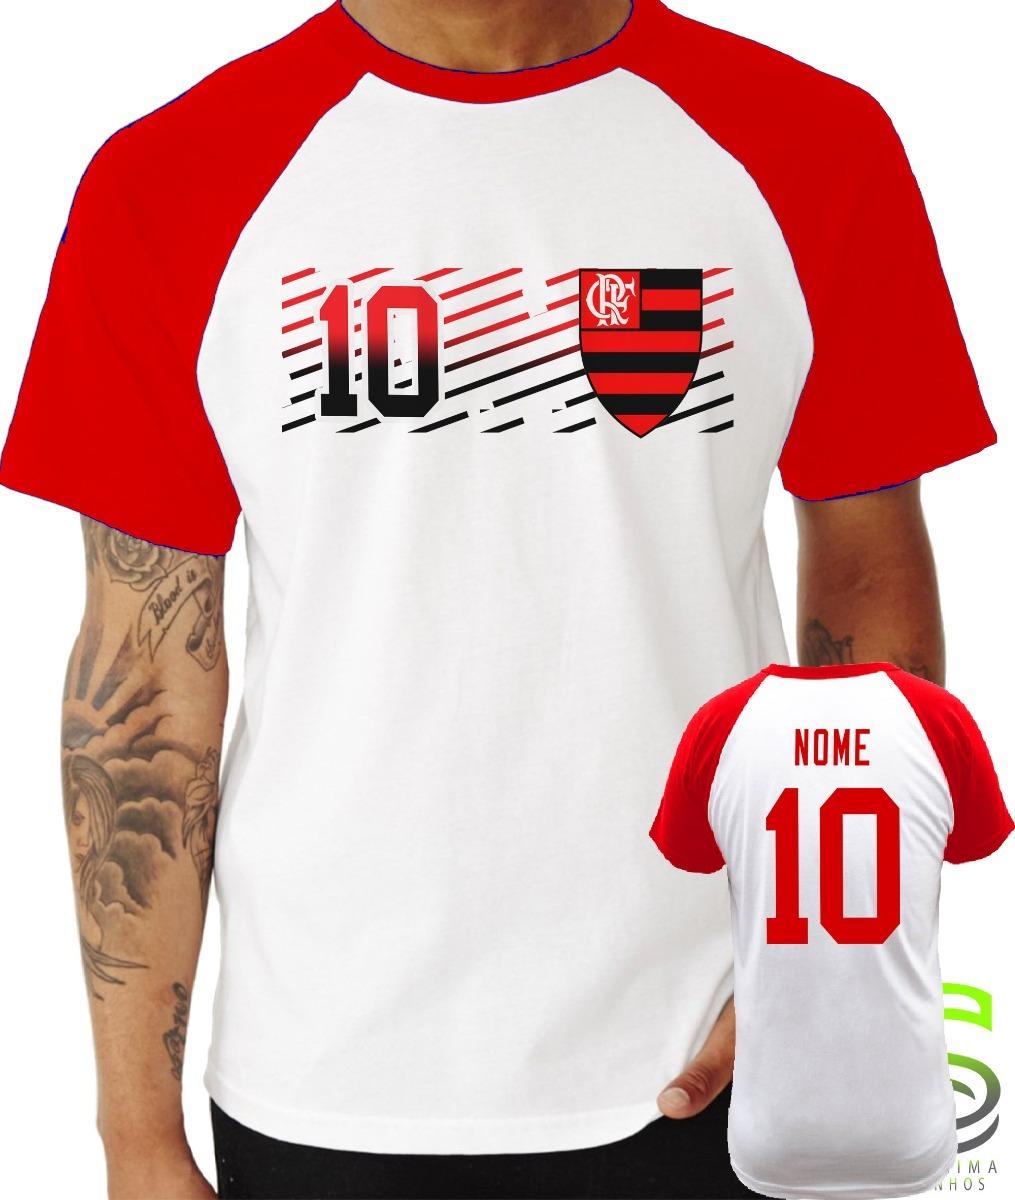 abc145d53a347 camisa camiseta flamengo personalizada raglan. Carregando zoom.